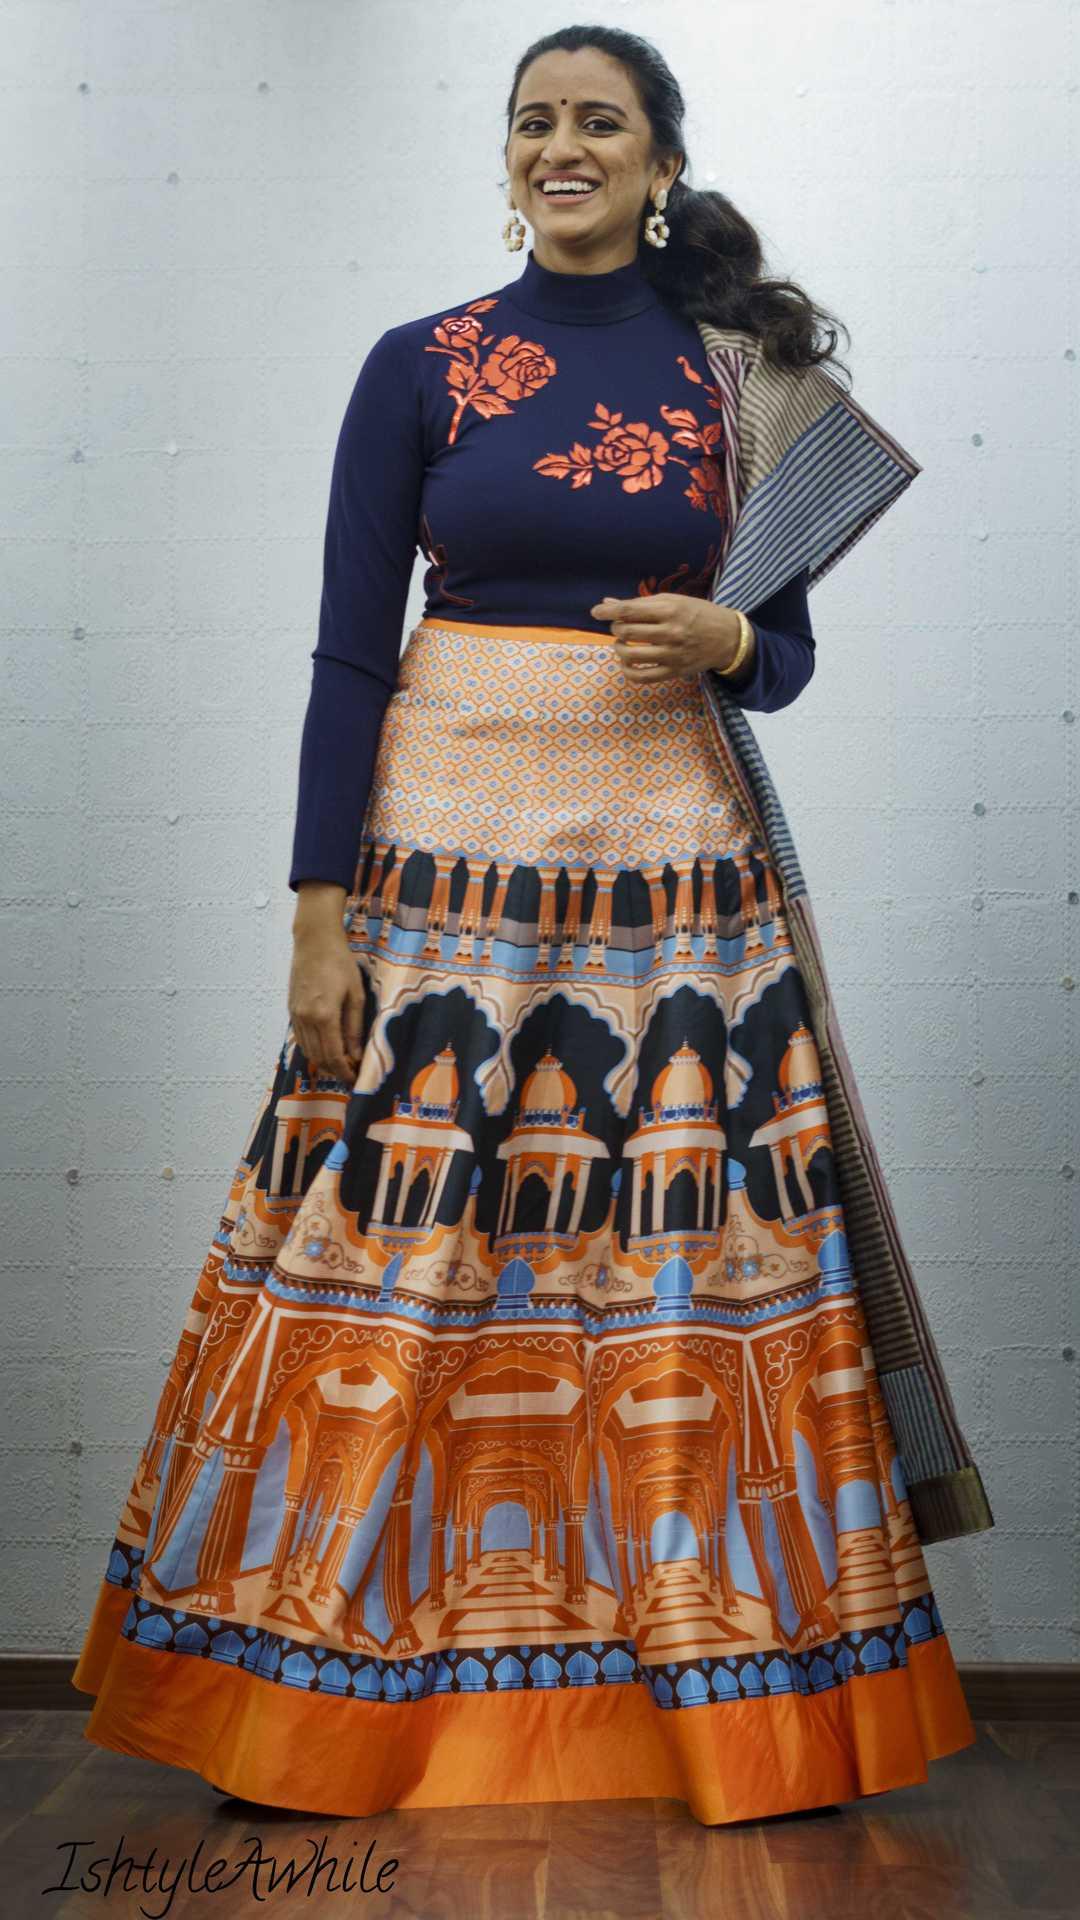 IshtyleAwhile - zingbi fashion